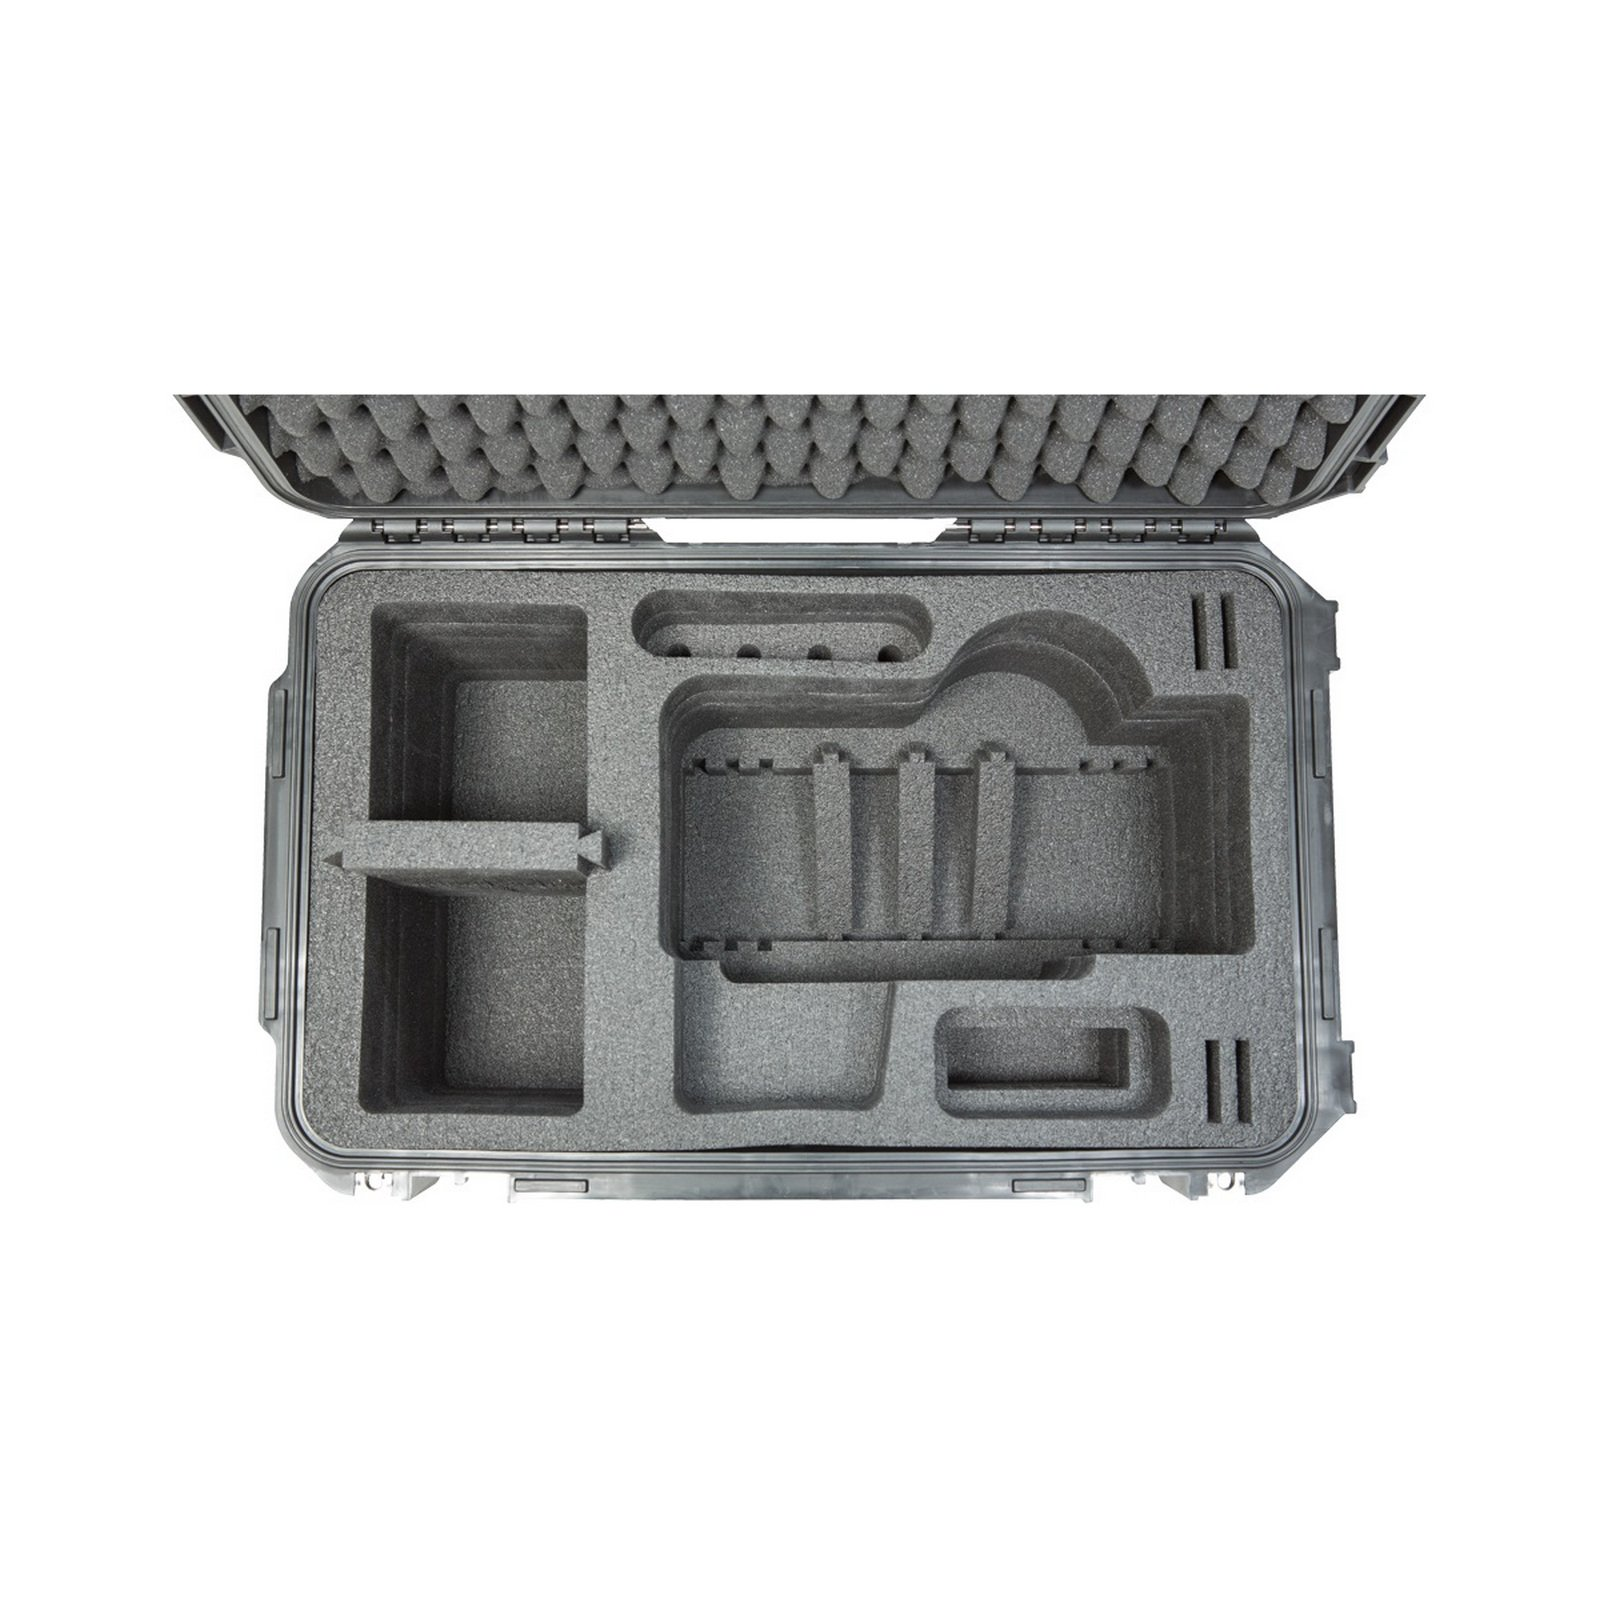 SKB 3i-221312BKU | iSeries Waterproof Case for BlackMagic URSA Mini Camera by SKB (Image #3)